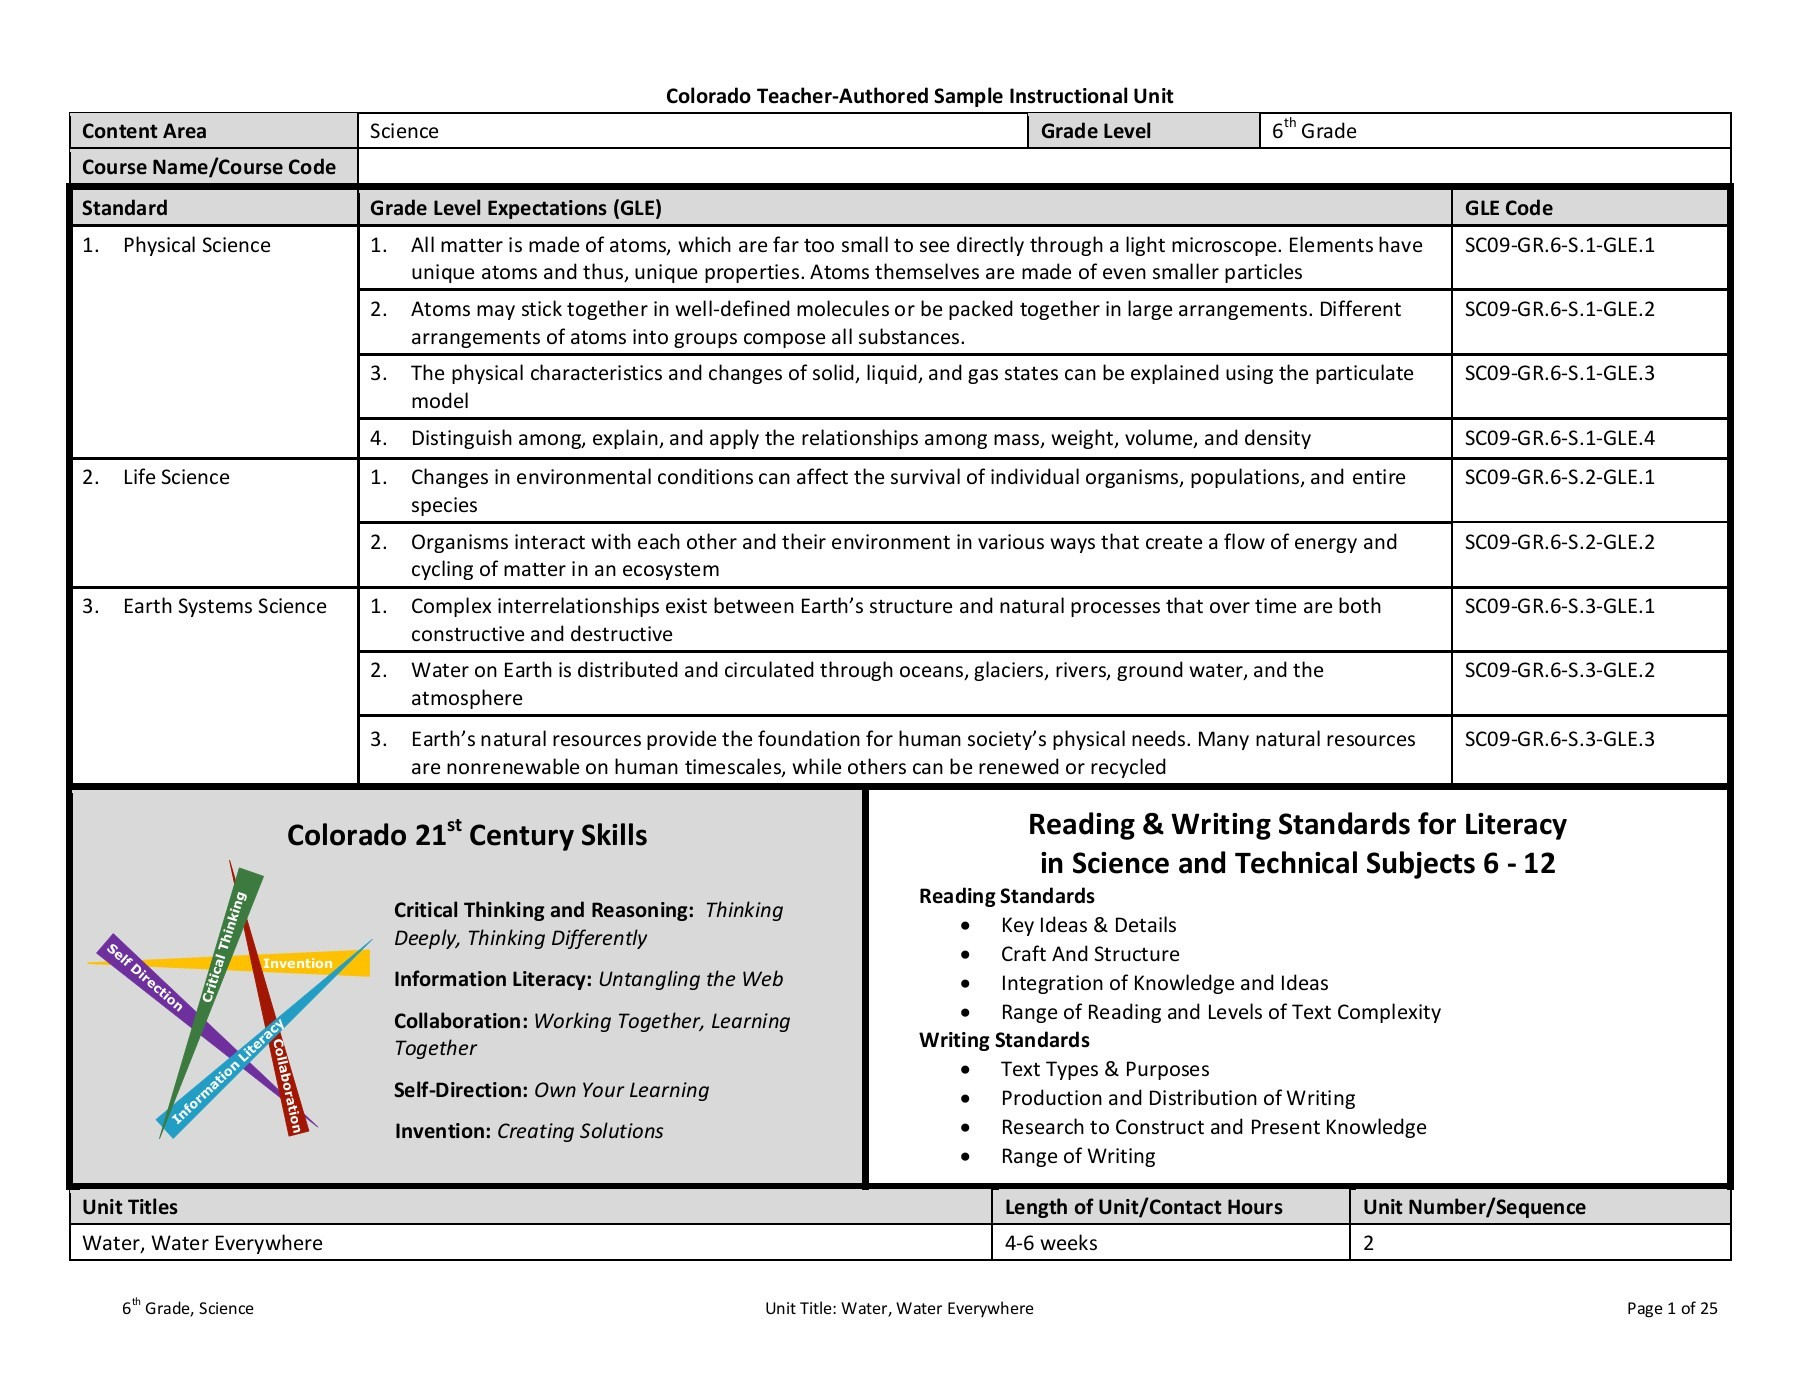 Colorado Teacher Authored Instructional Unit Sample Th